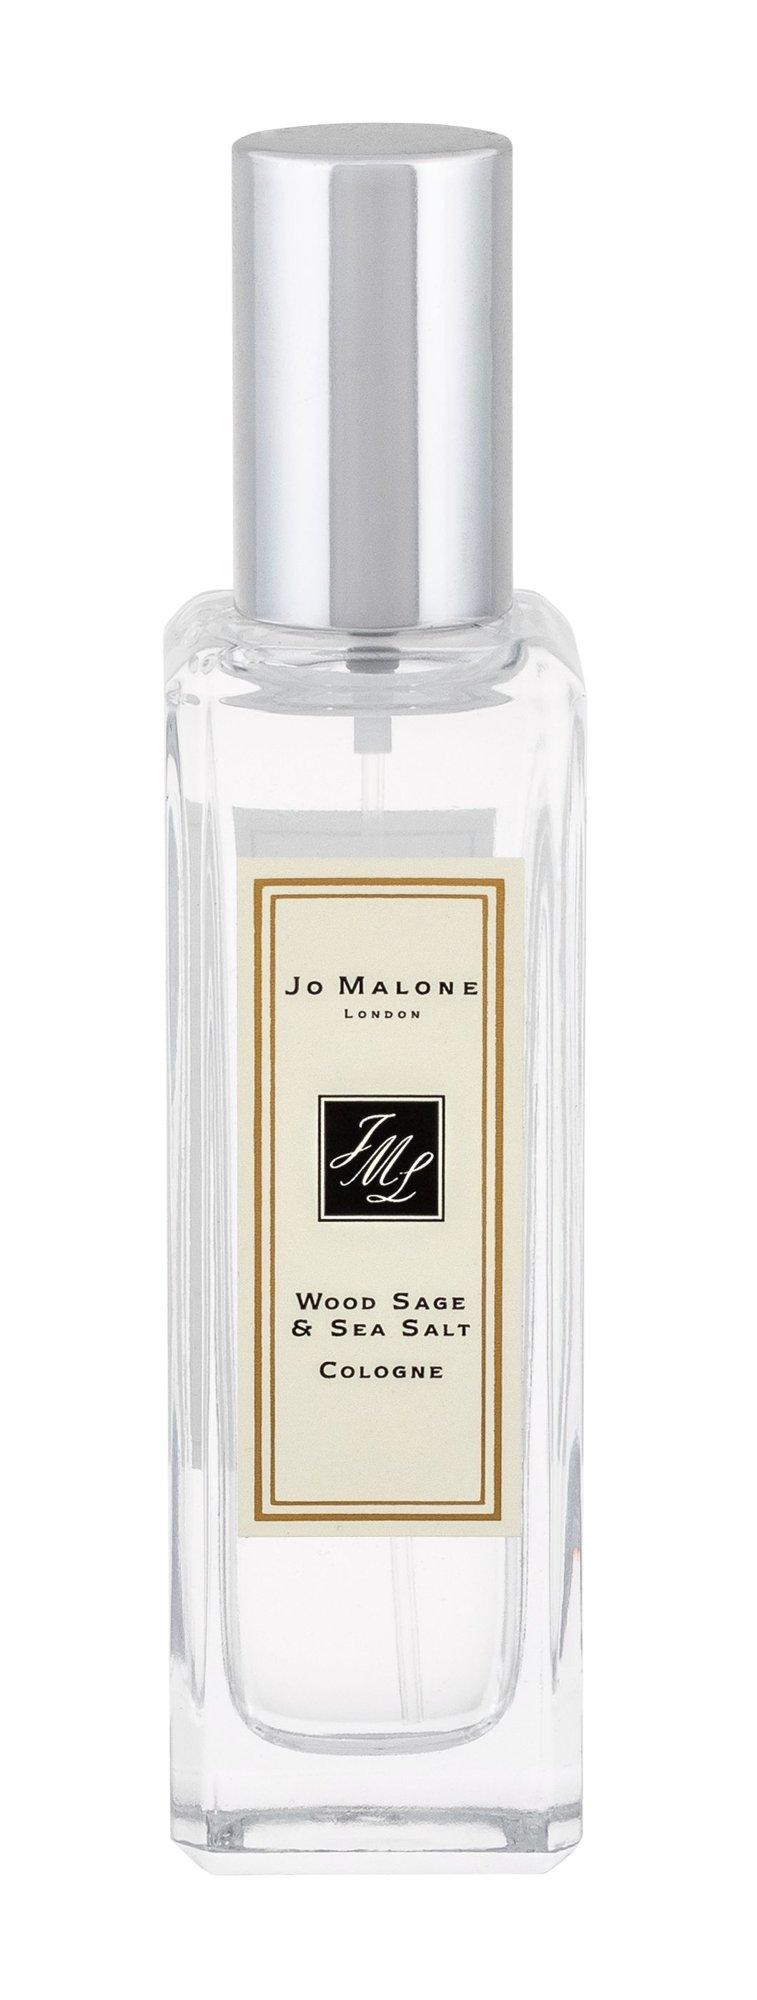 Jo Malone Wood Sage & Sea Salt Eau de Cologne 30ml